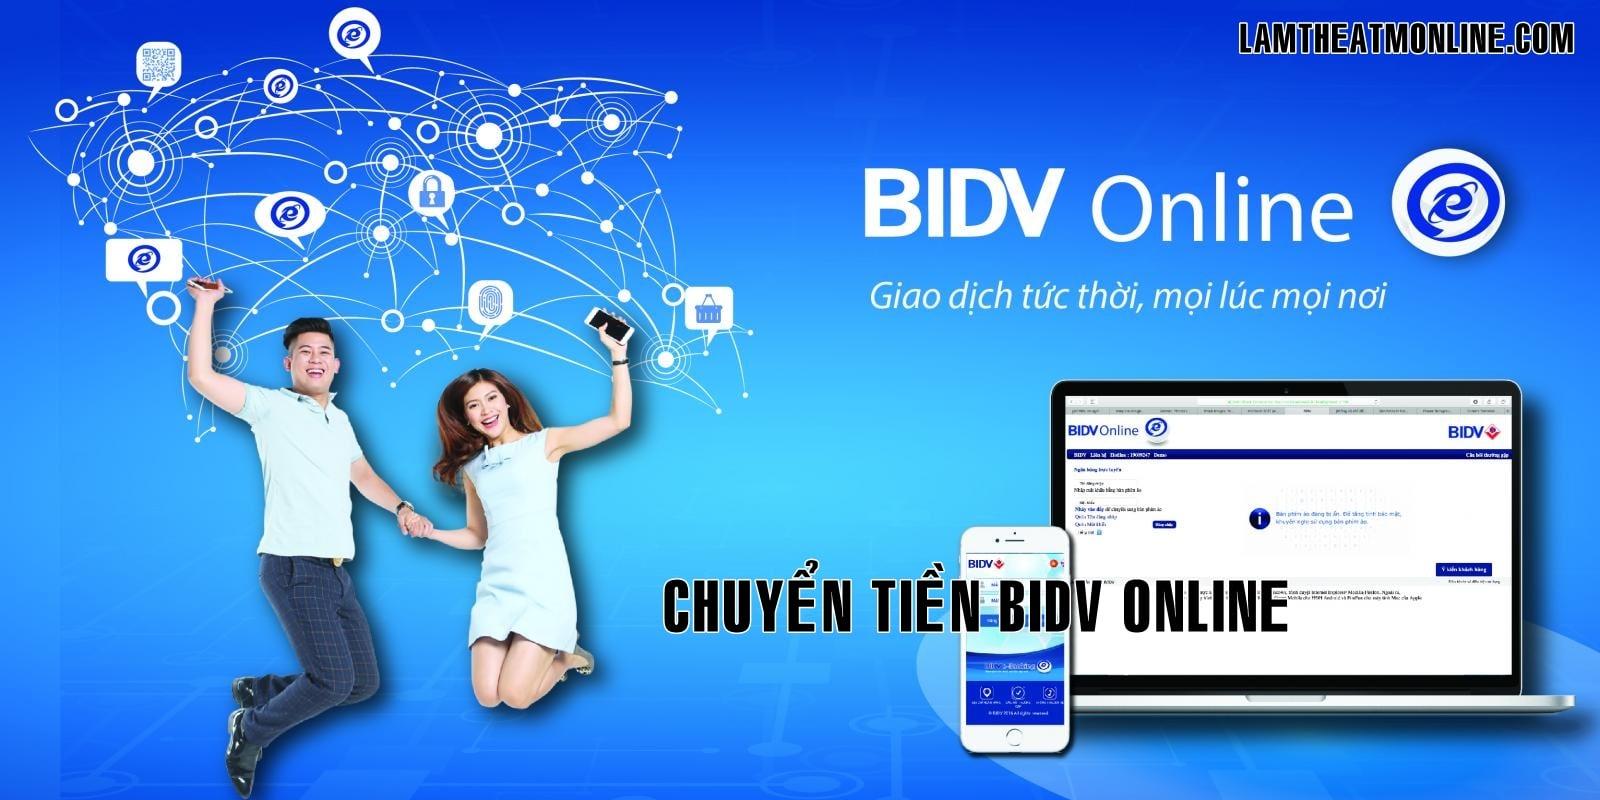 Huong dan chuyen tien bidv online